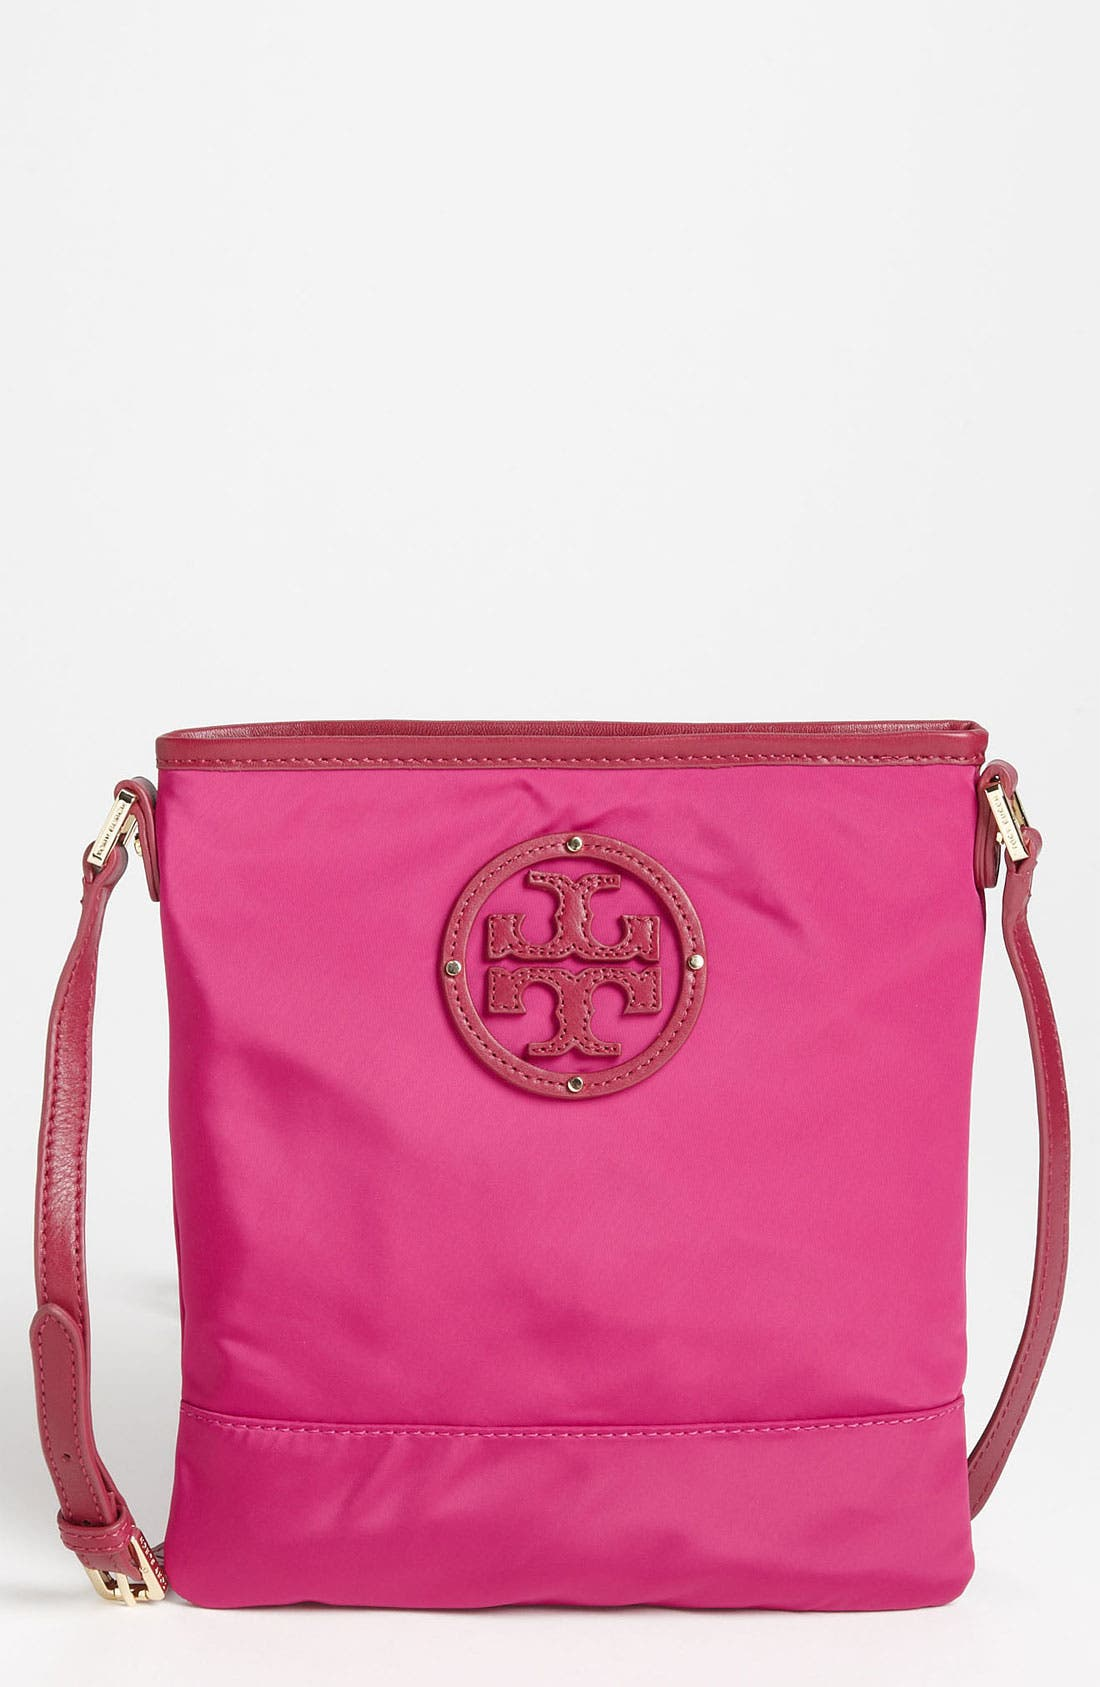 Main Image - Tory Burch Stacked Logo Crossbody Bag